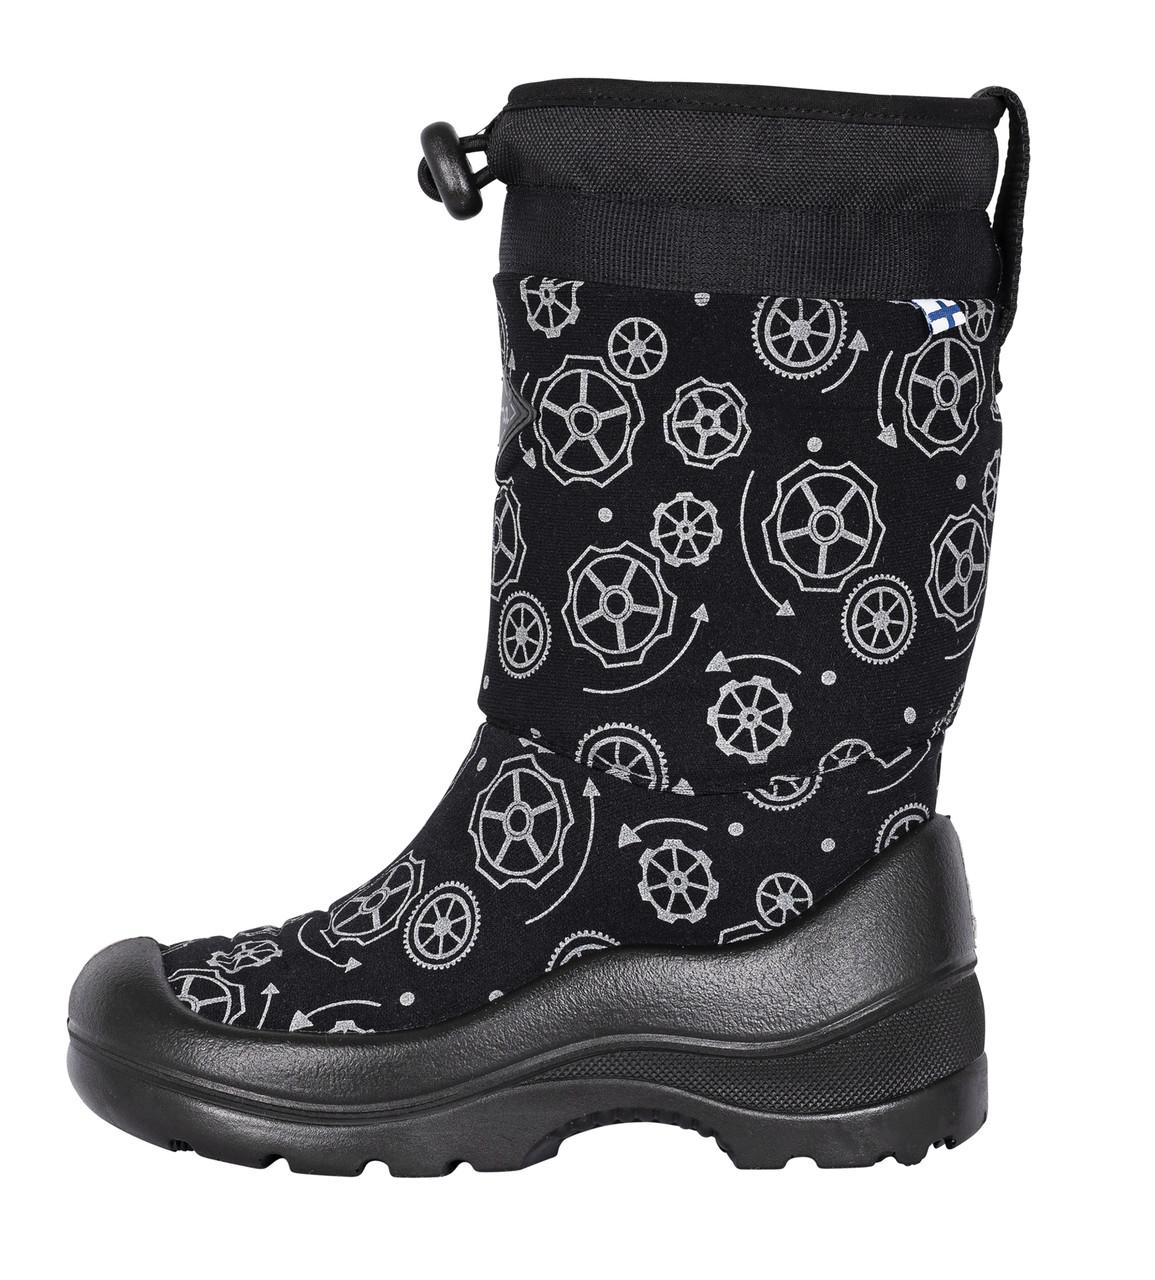 Обувь детская Kuoma Snow snowlock, Black Wheel